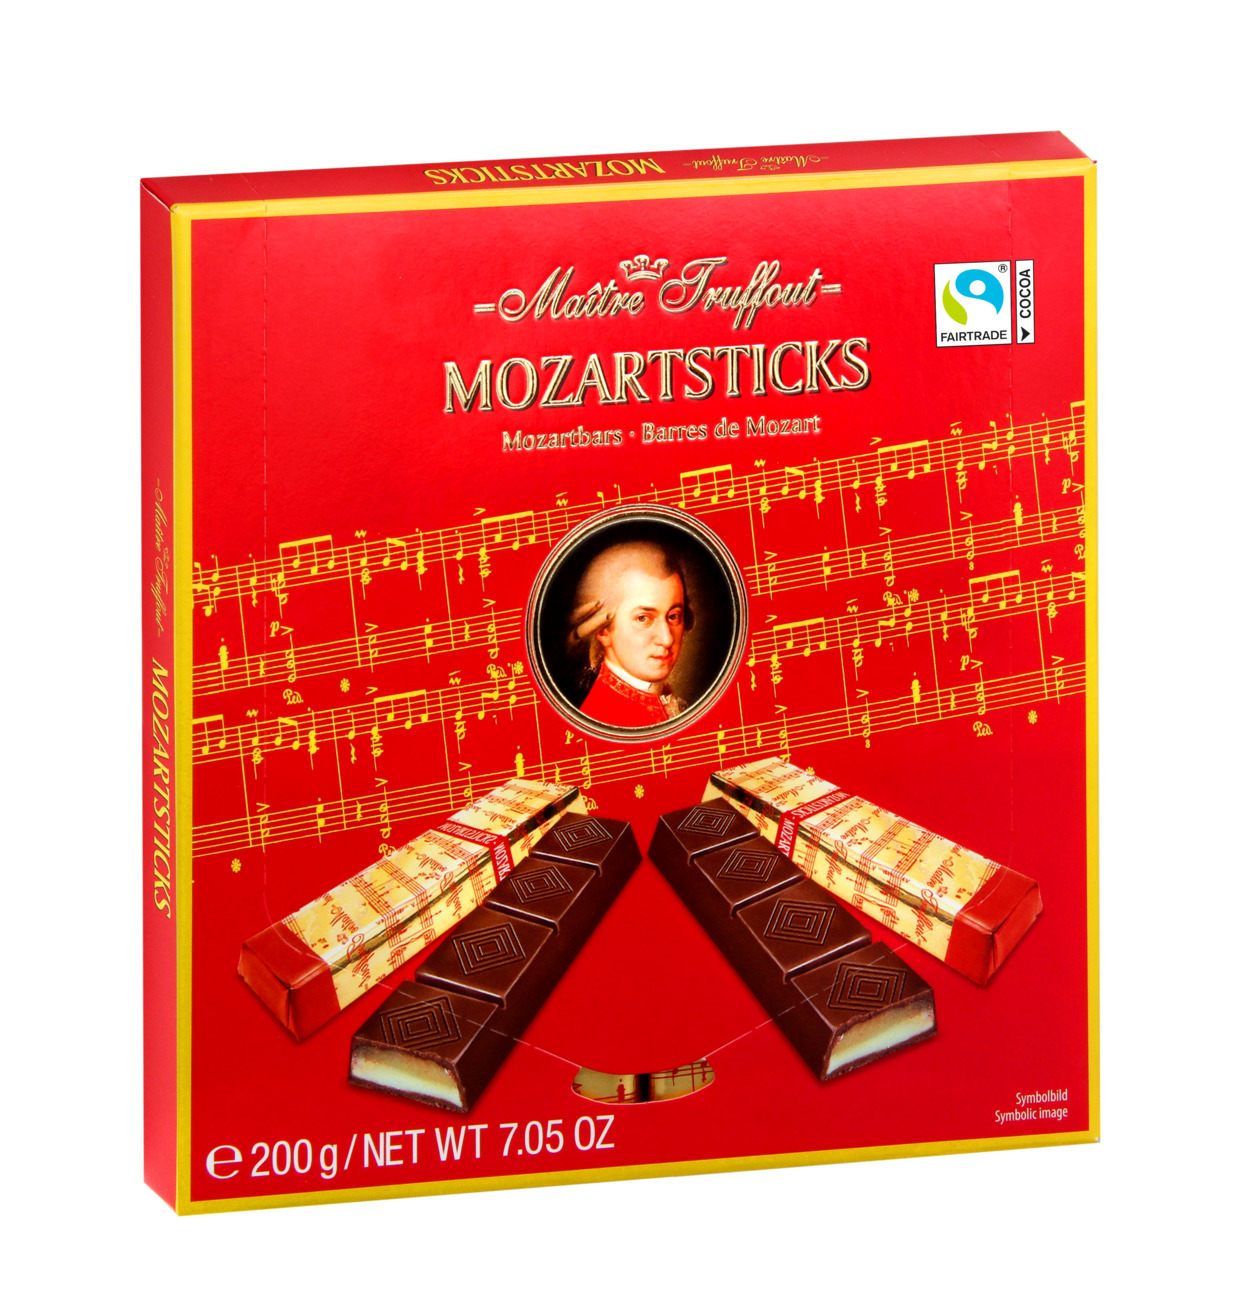 Mozartsticks